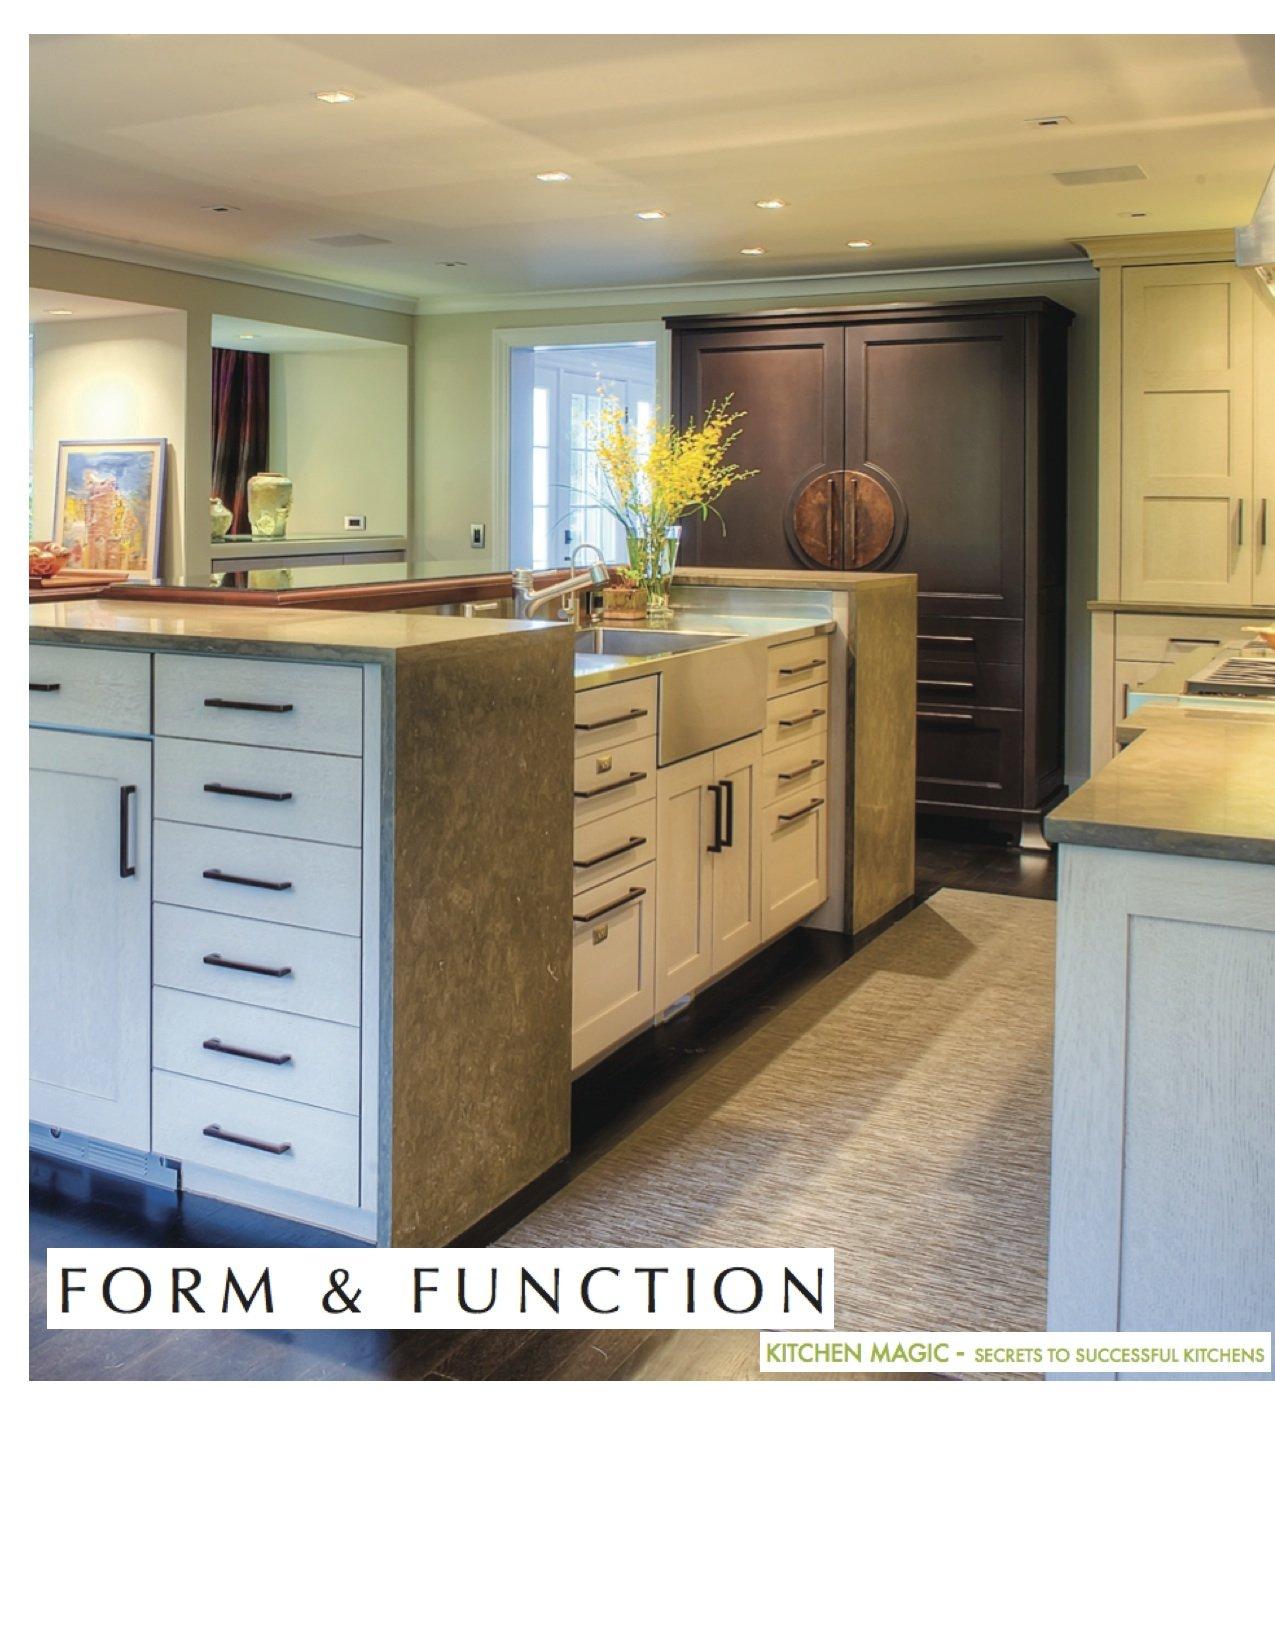 Kitchen Magic - Secrets to Successful Kitchens: 9781467541756 ...